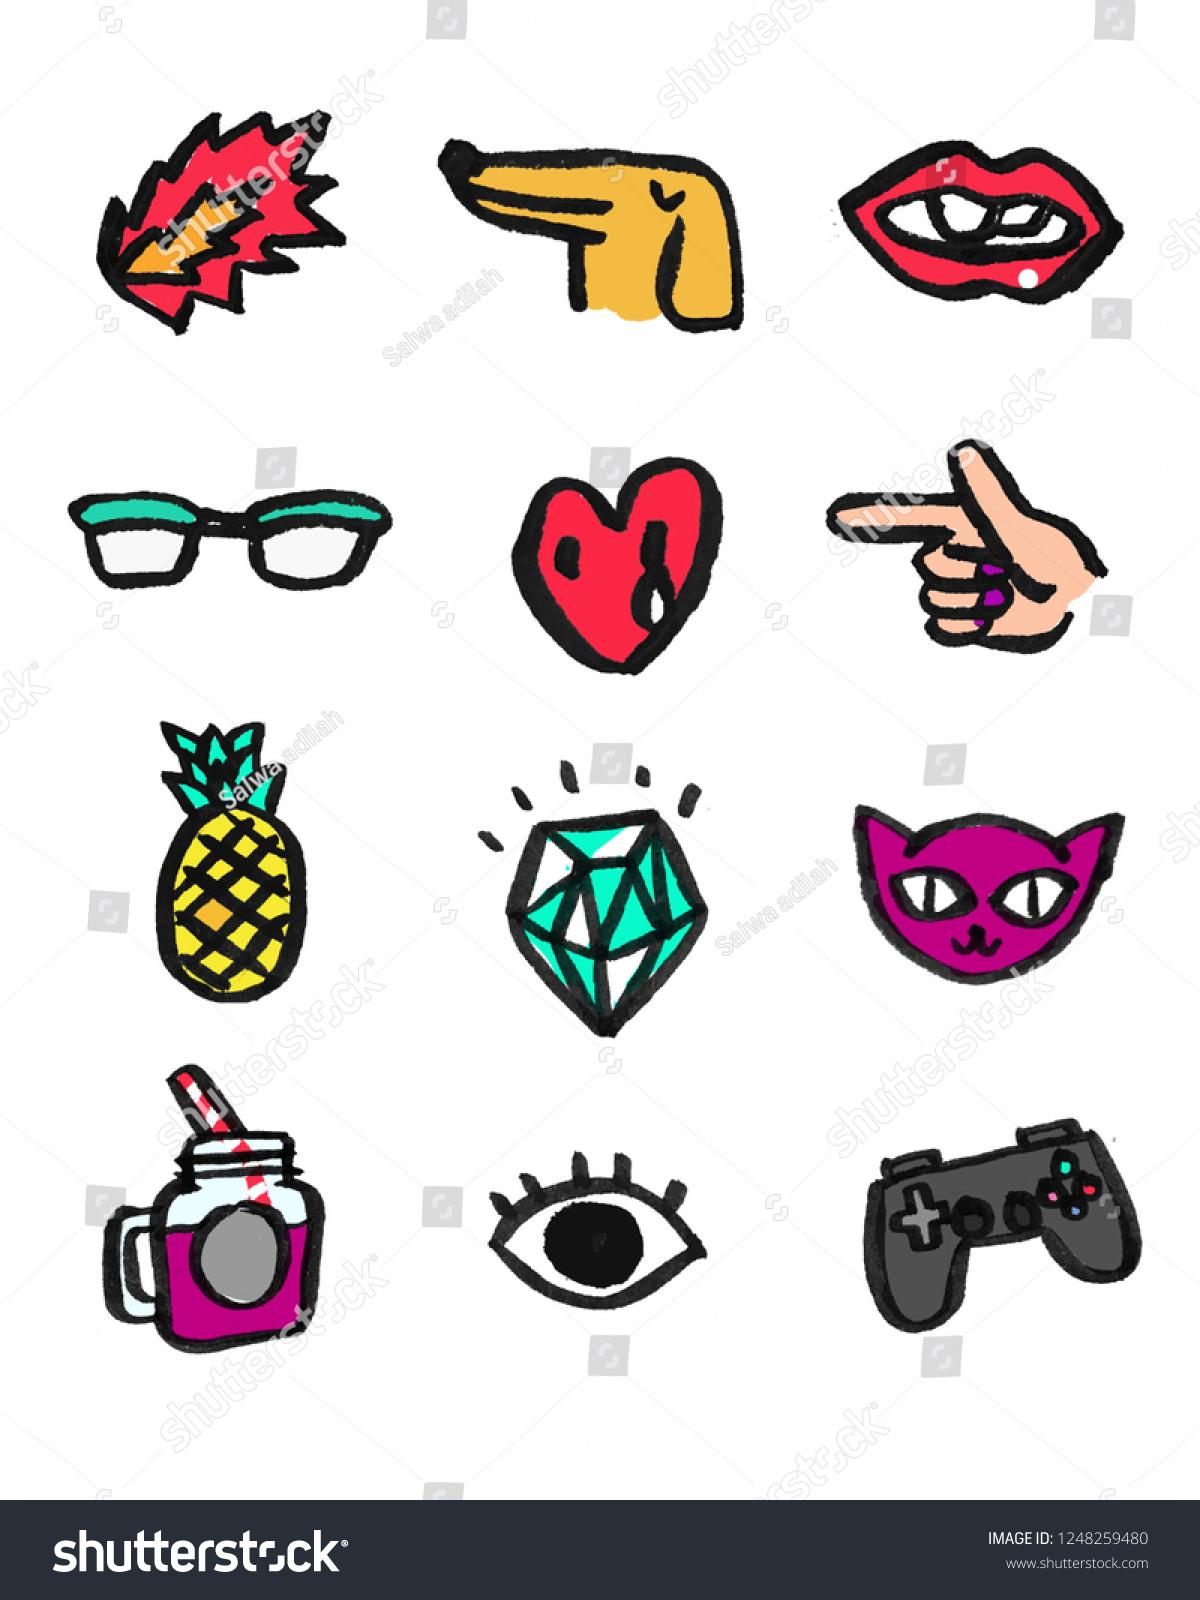 Sticker Logo Symbol Sign Tumblr Aesthetic Stock Illustration ...